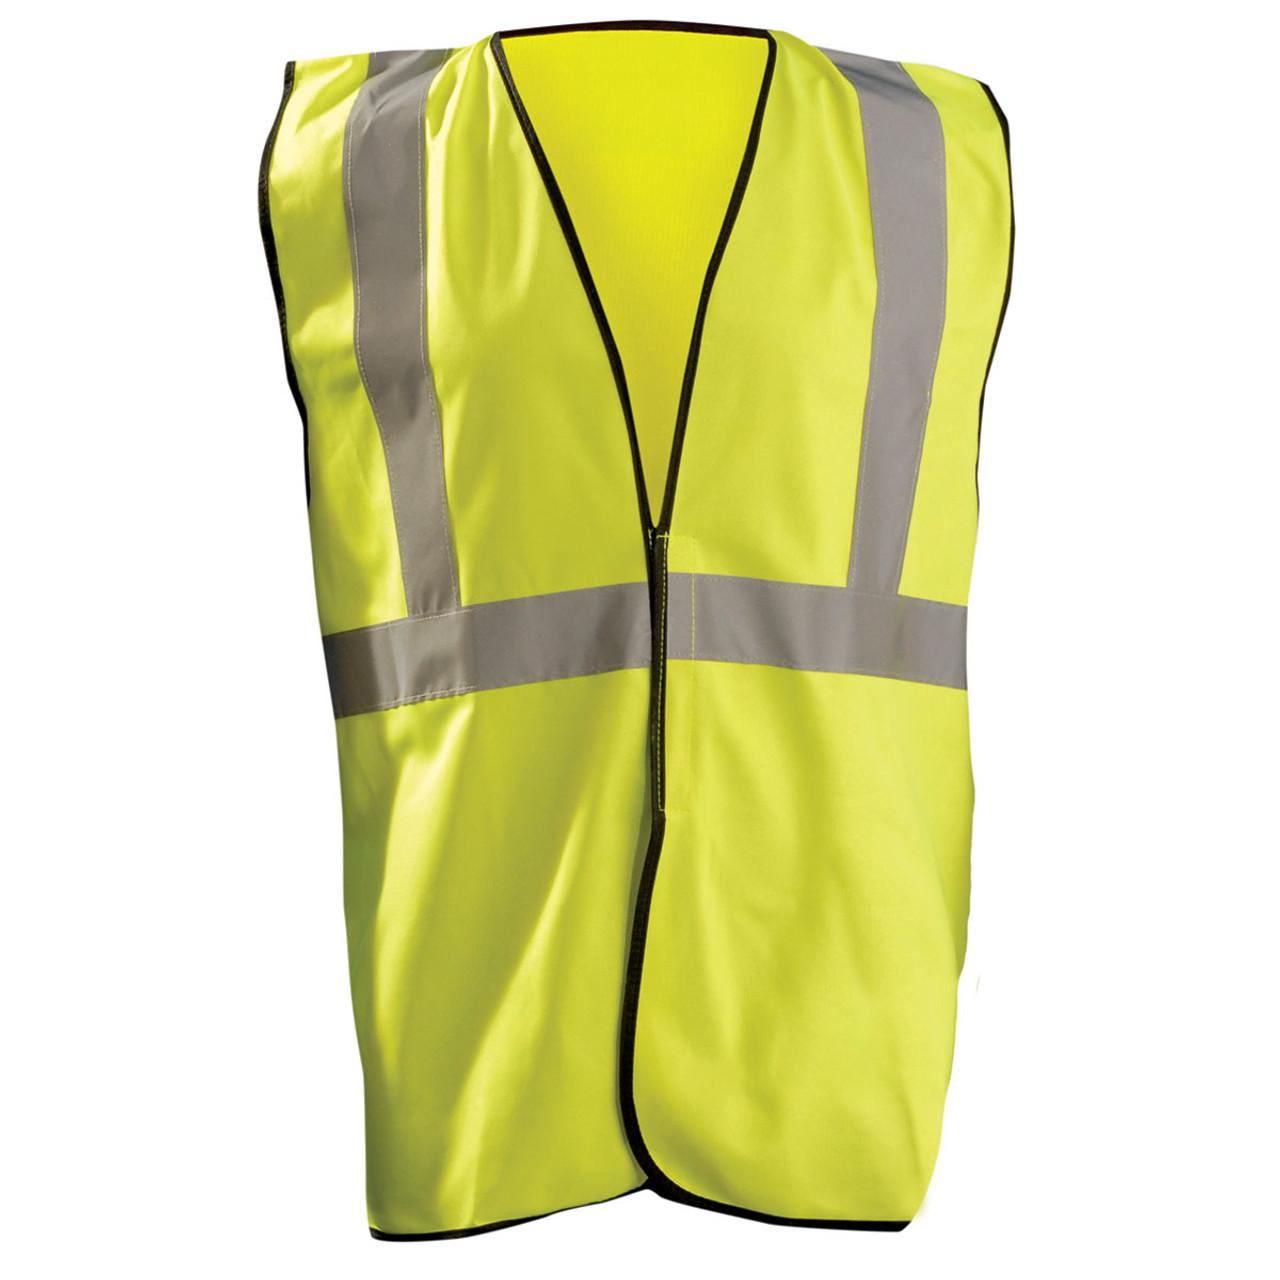 4886cfacb61 Occunomix Class 2 Hi Vis Economy Safety Vest ECO-G Yellow Front